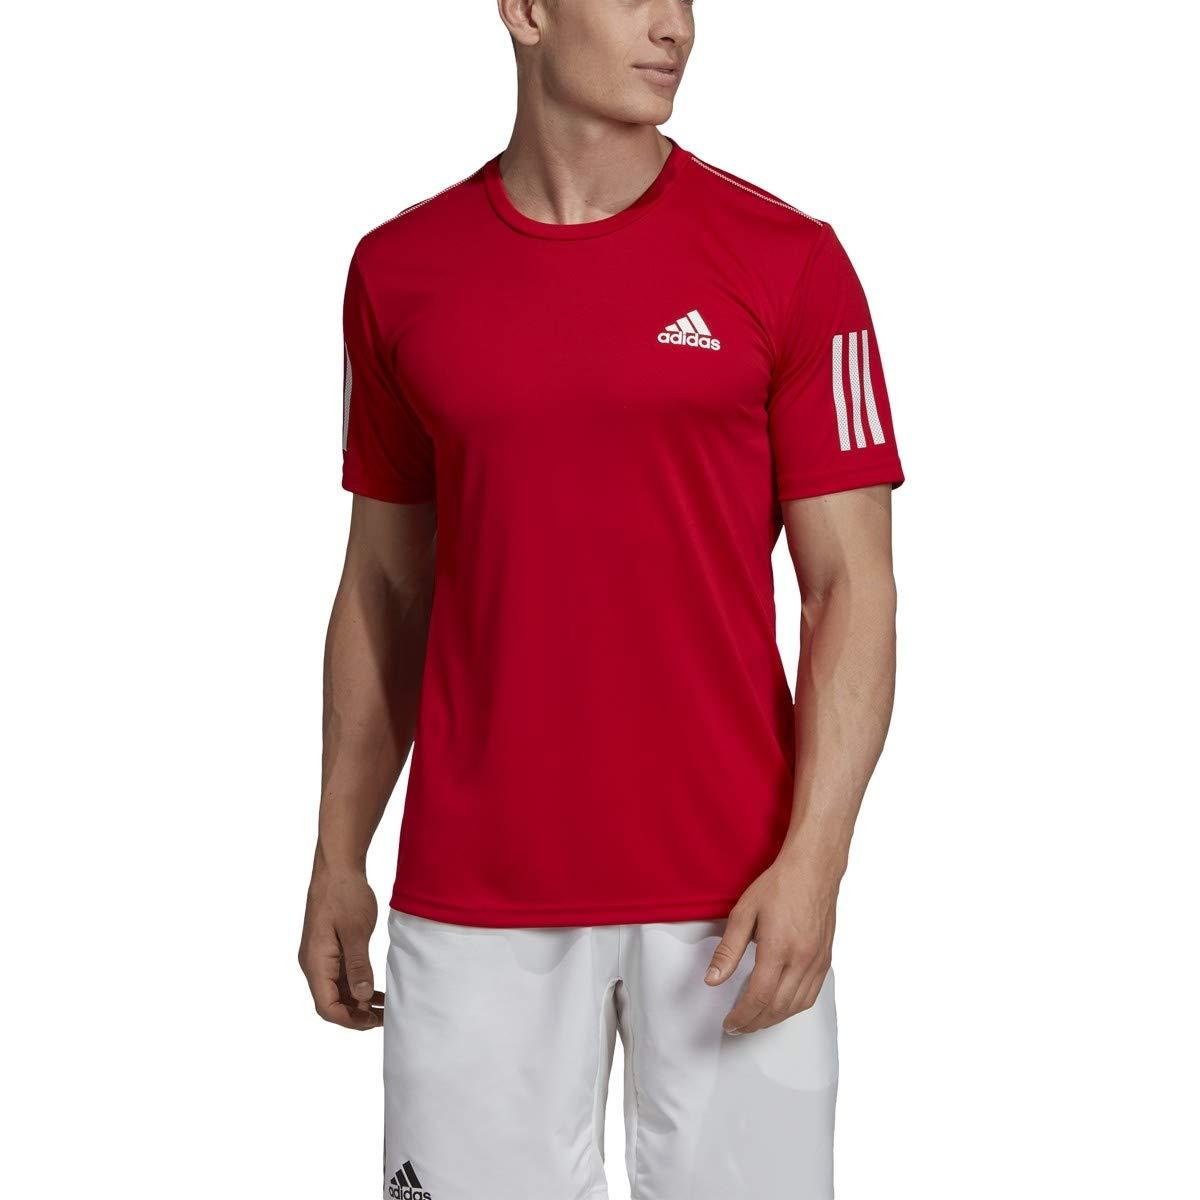 adidas Men's 3-Stripes Club Tennis Tee, Scarlet, Small by adidas (Image #1)